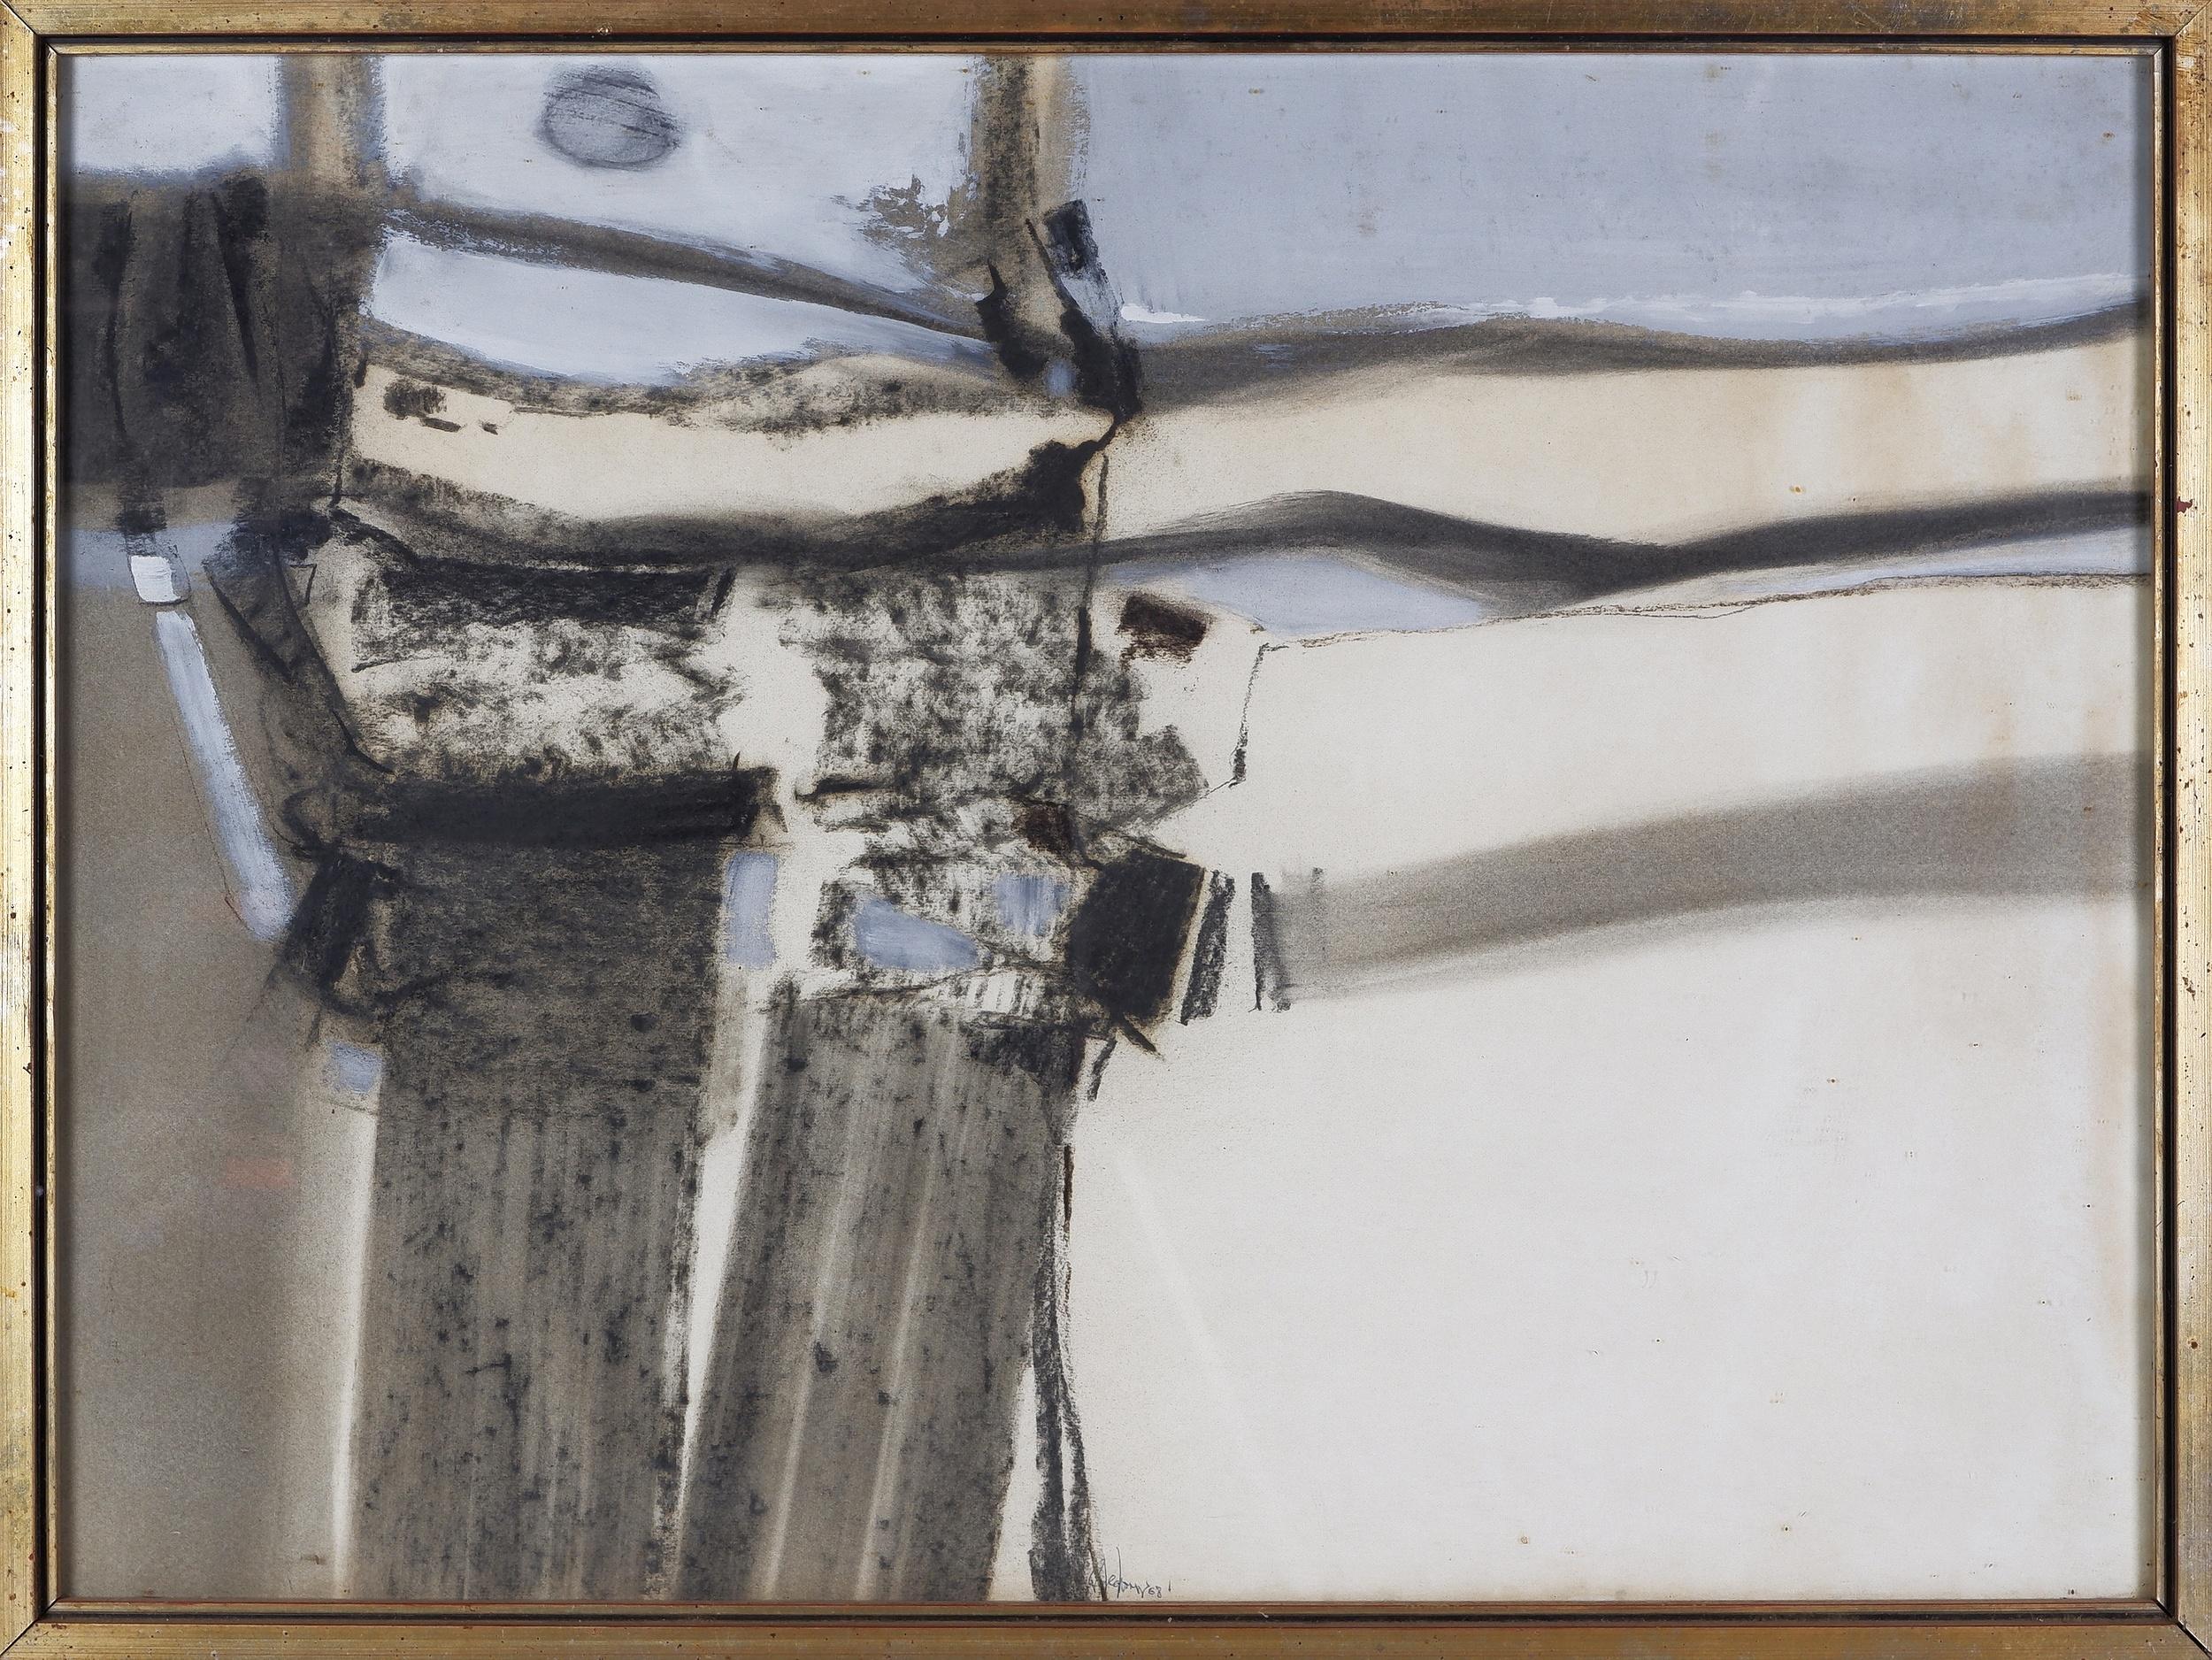 'Thomas Gleghorn (born 1925), Untitled (Abstract) 1968, Mixed Media on Paper'